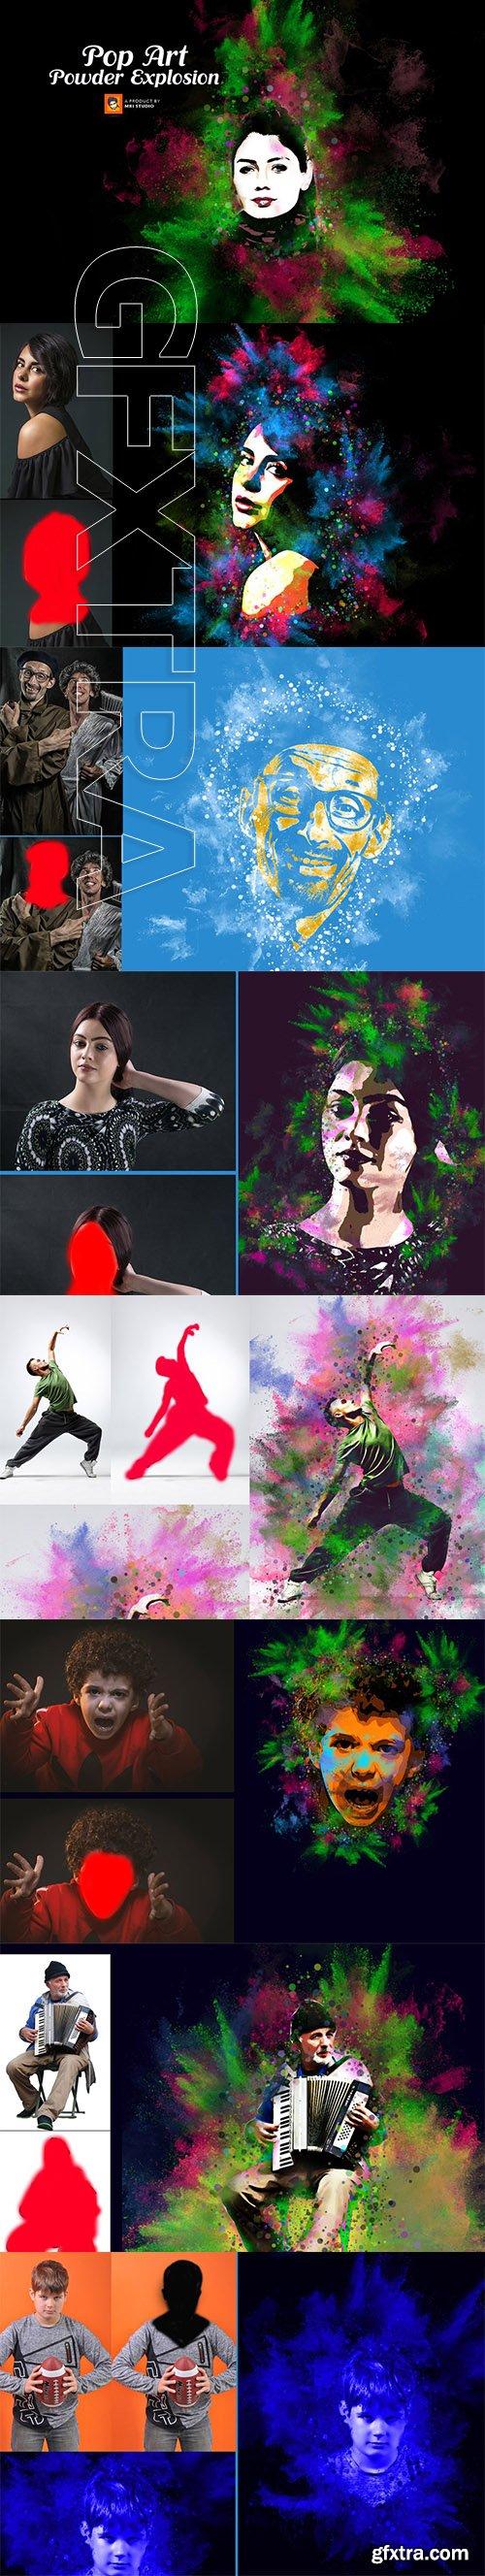 CreativeMarket - Pop Art Powder Explosion Action 3253760